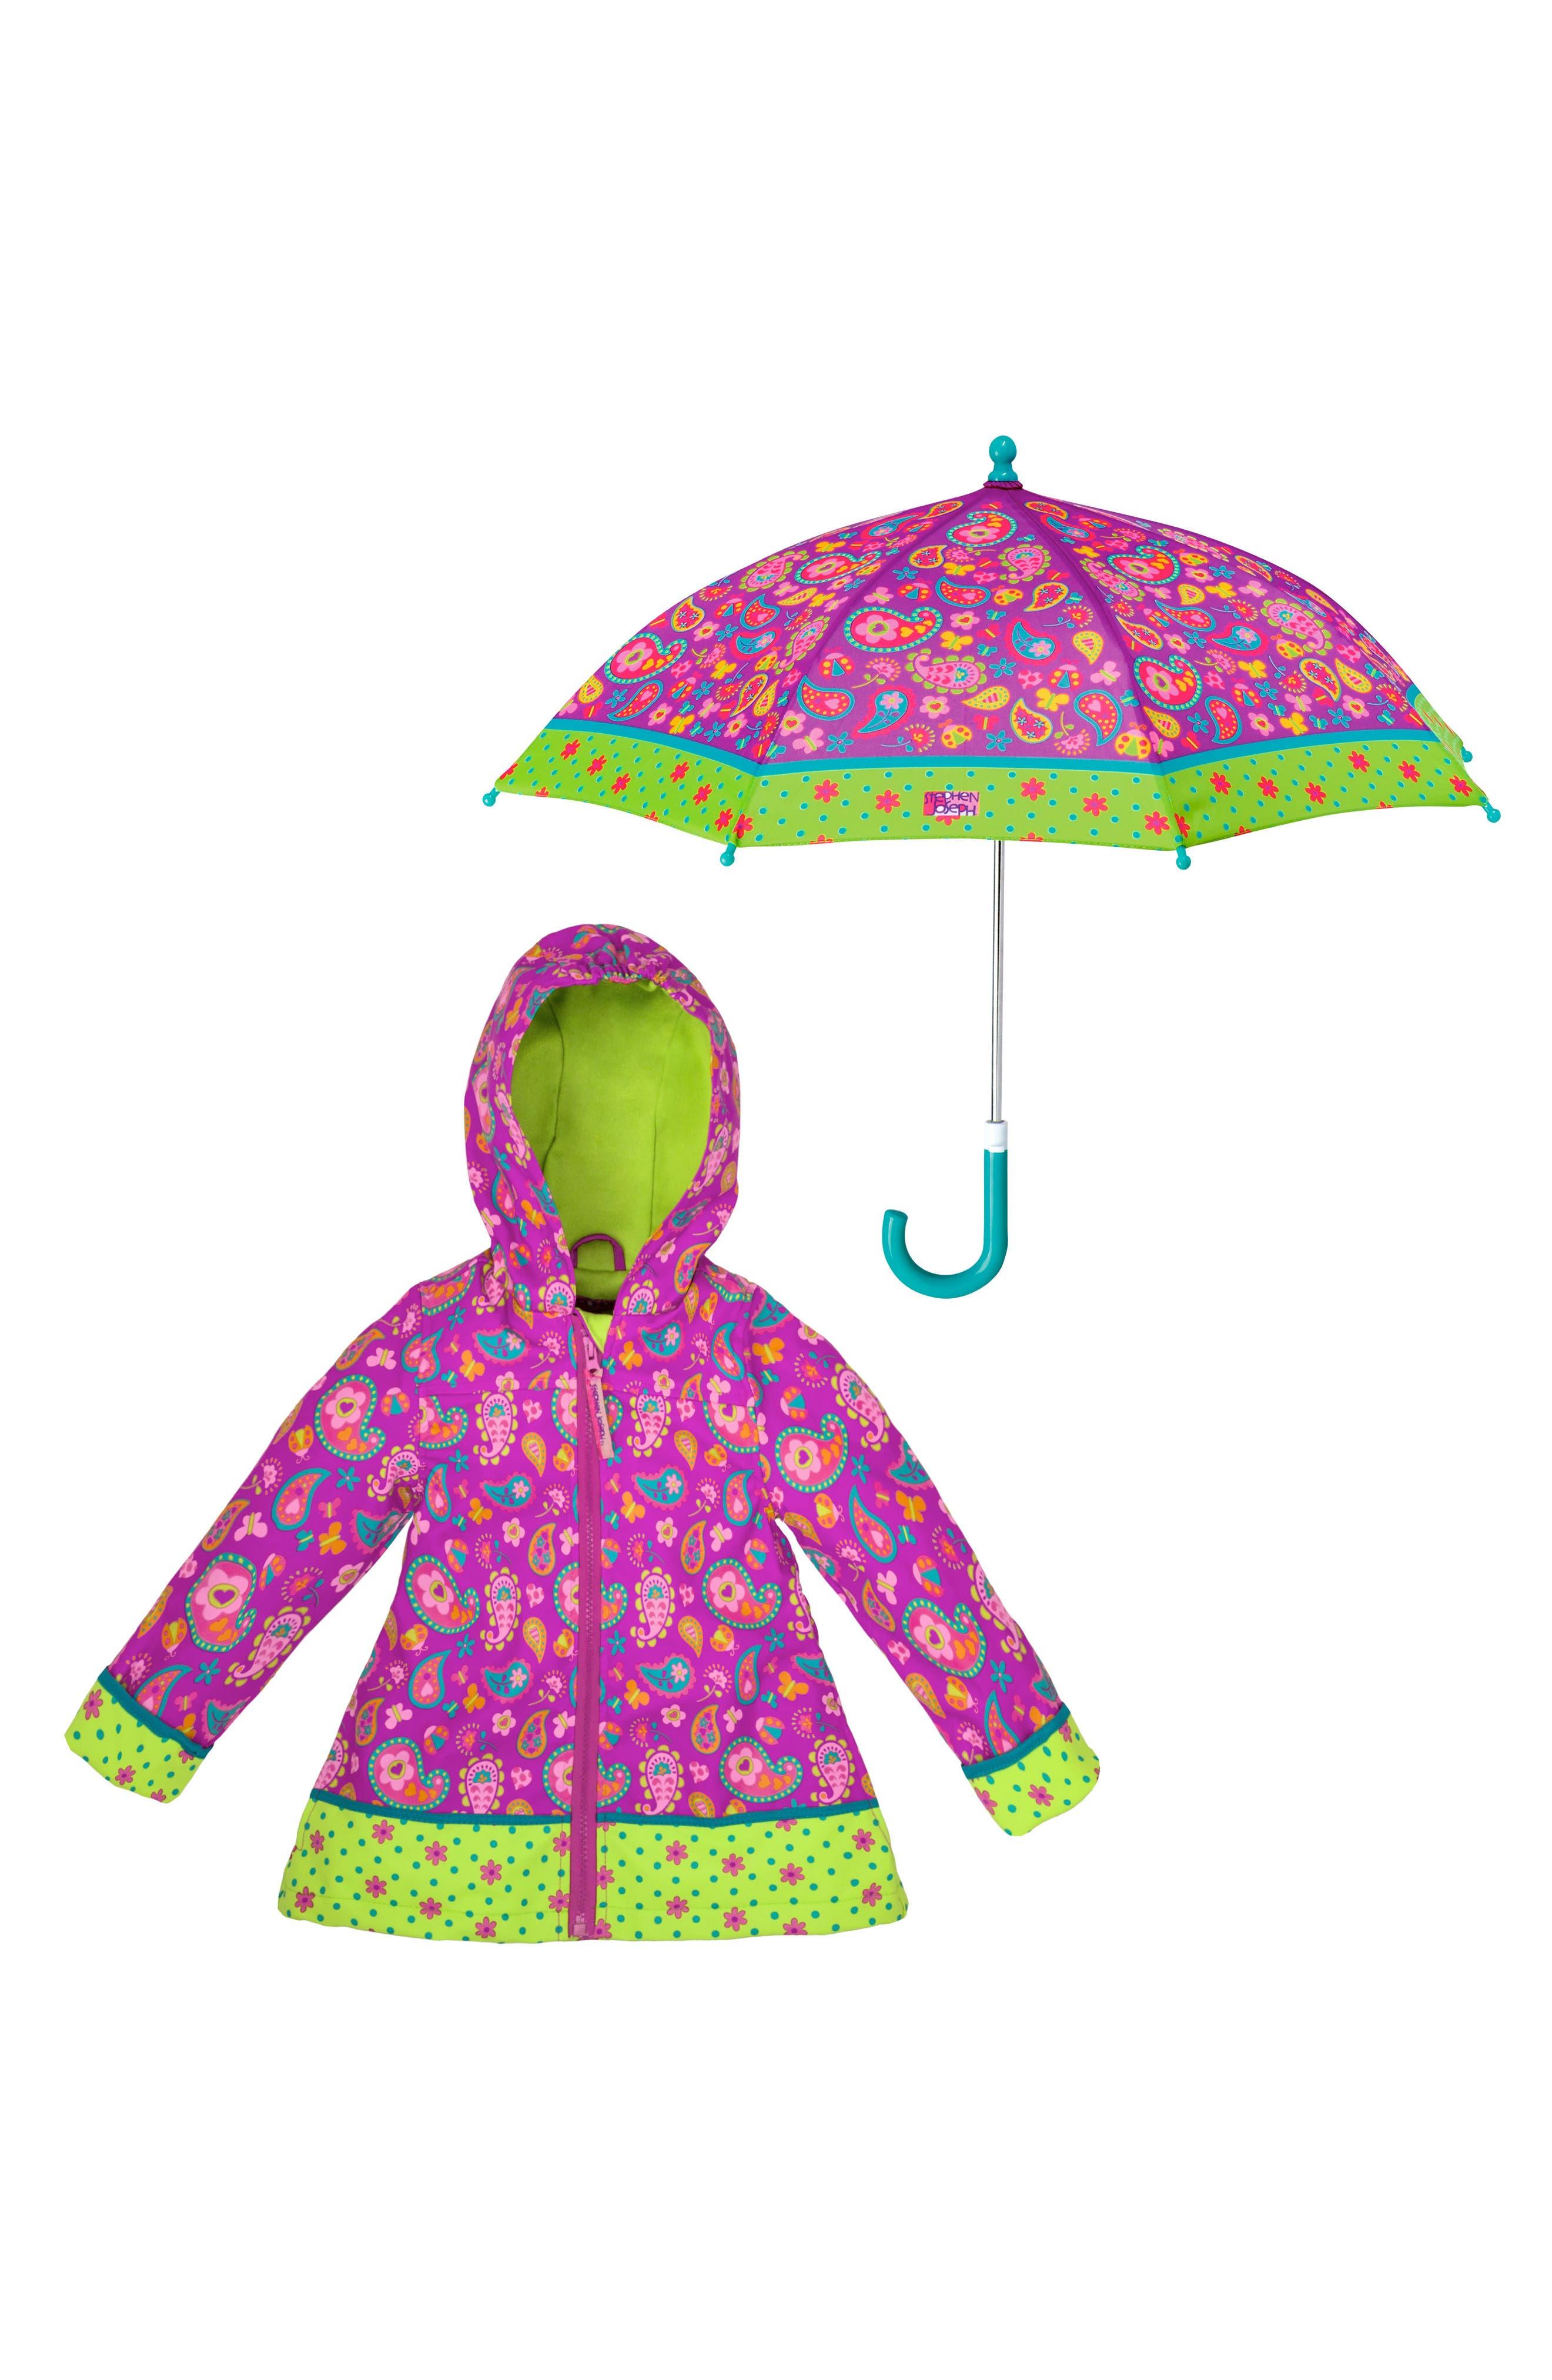 Toddler Girls Stephen Joseph Print Raincoat  Umbrella Set